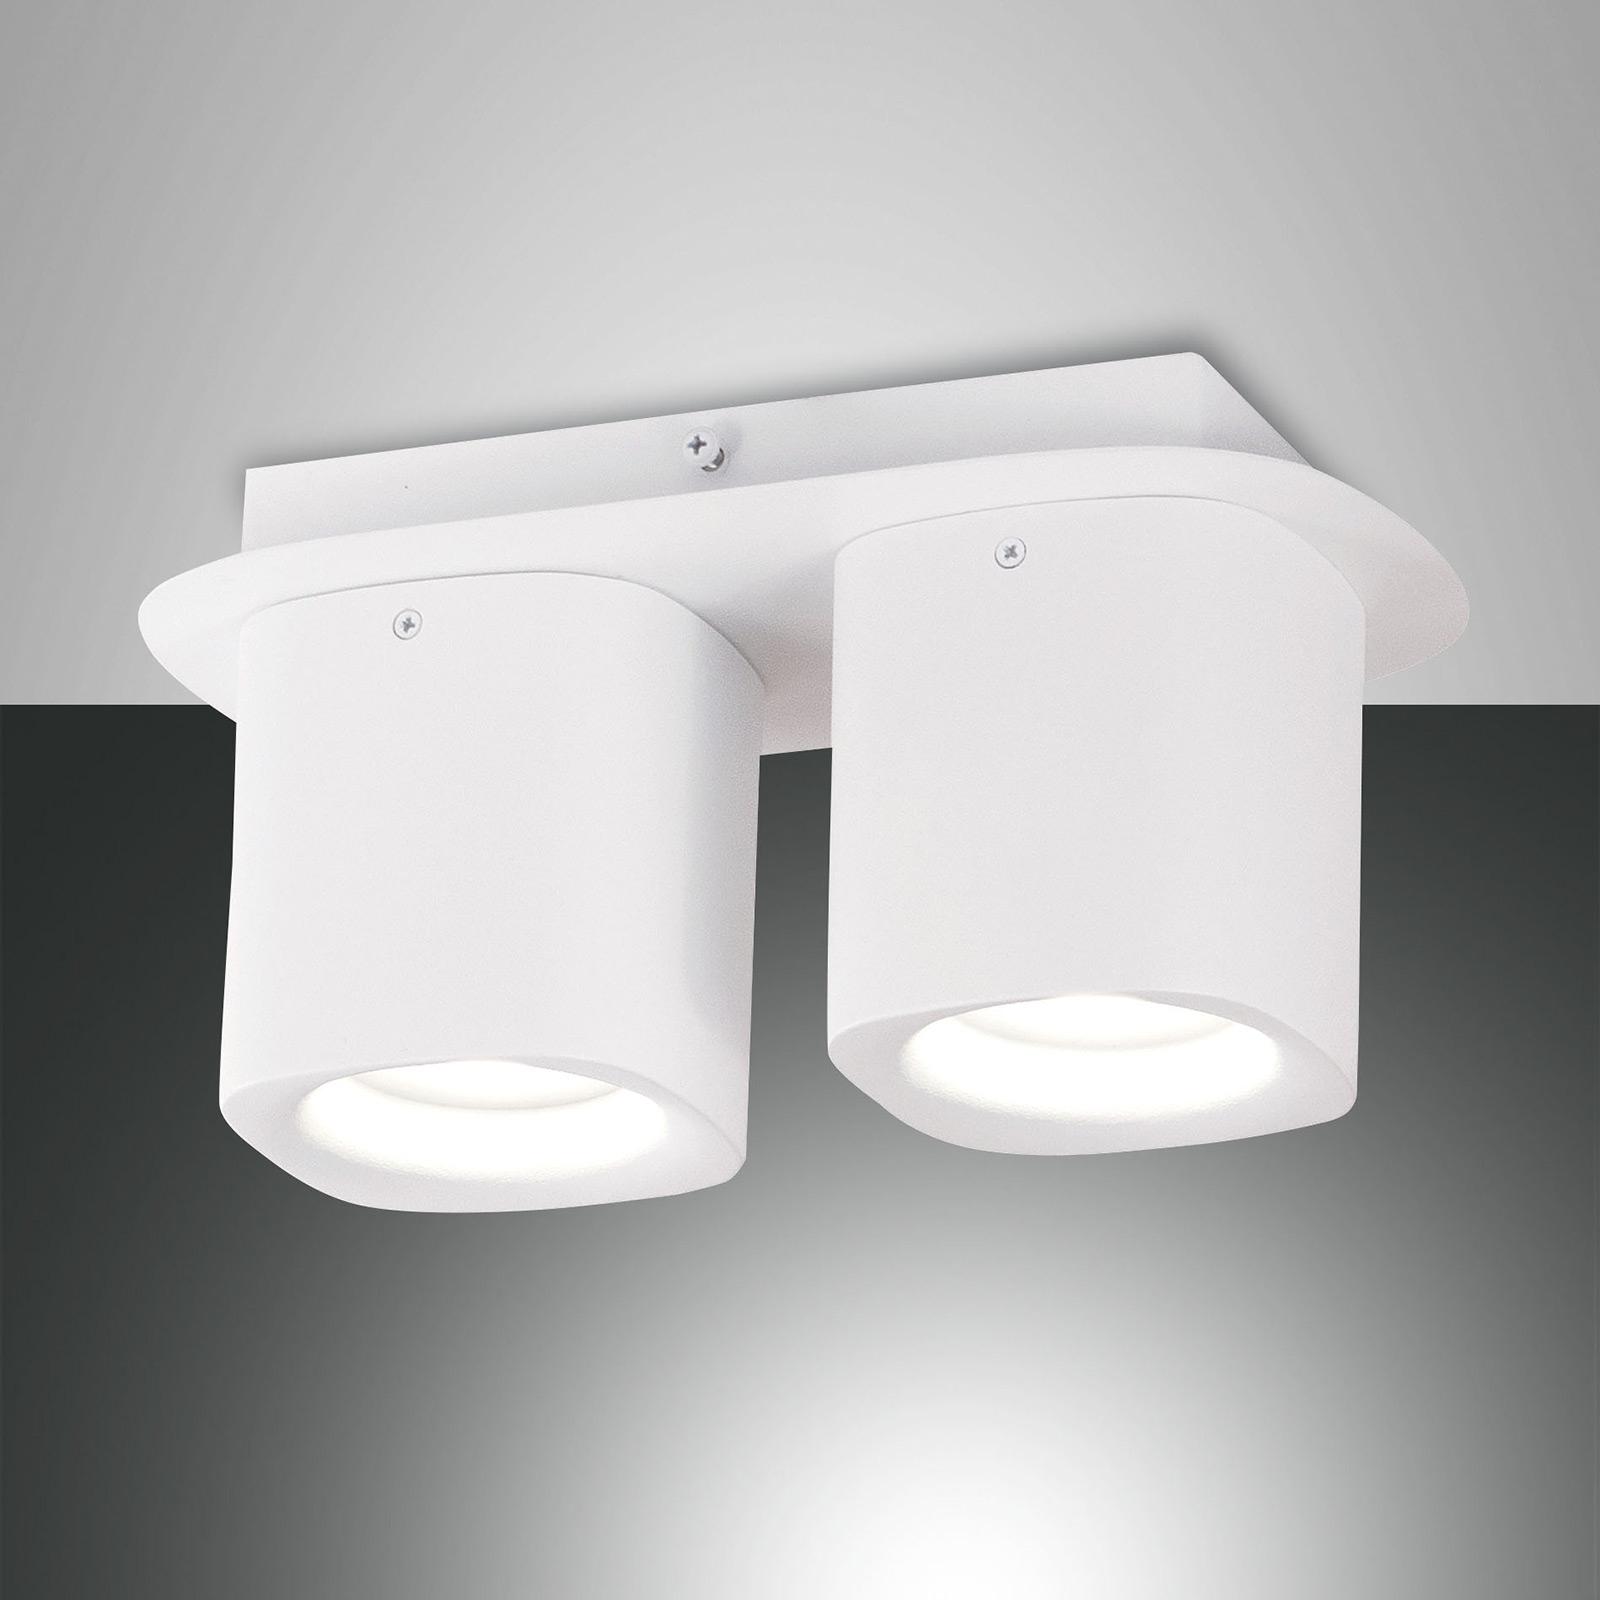 Lampa sufitowa Smooth, 2-punktowa, biała